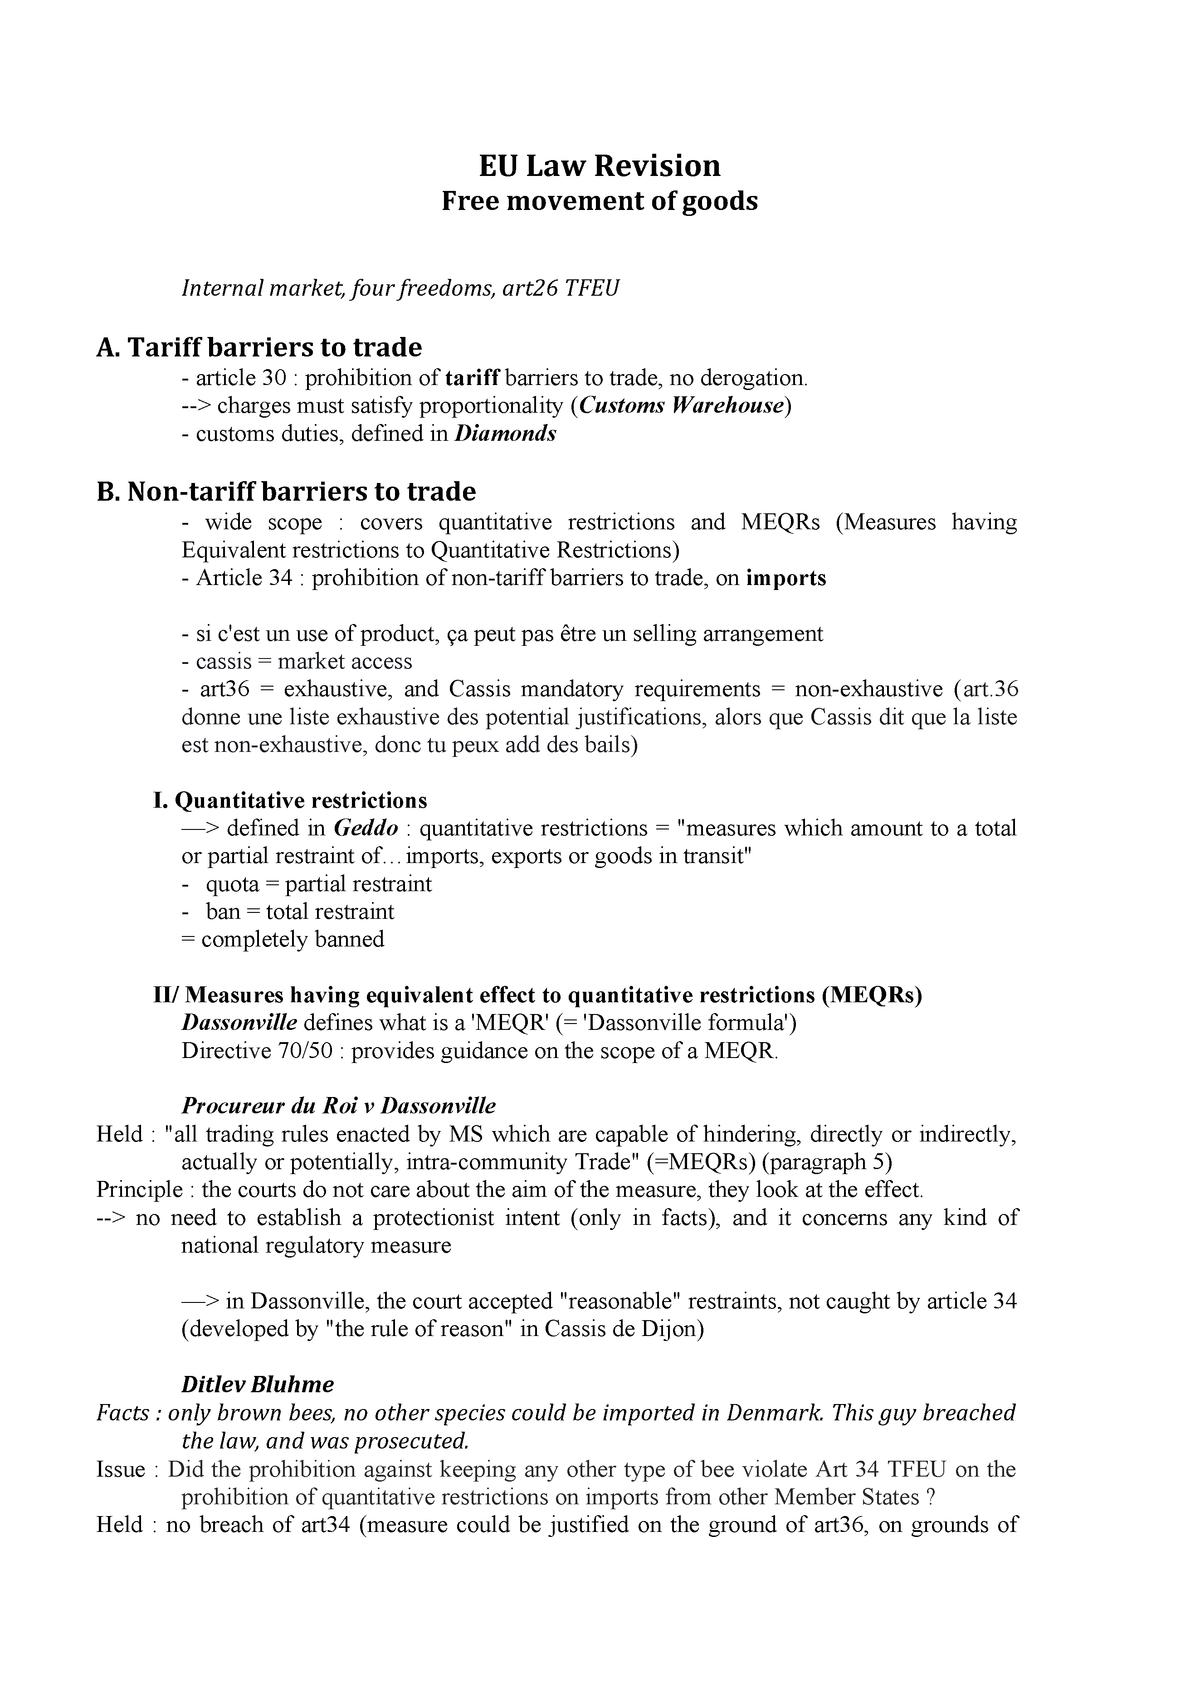 EU Law Revision - Exams - Summary European Law - StuDocu